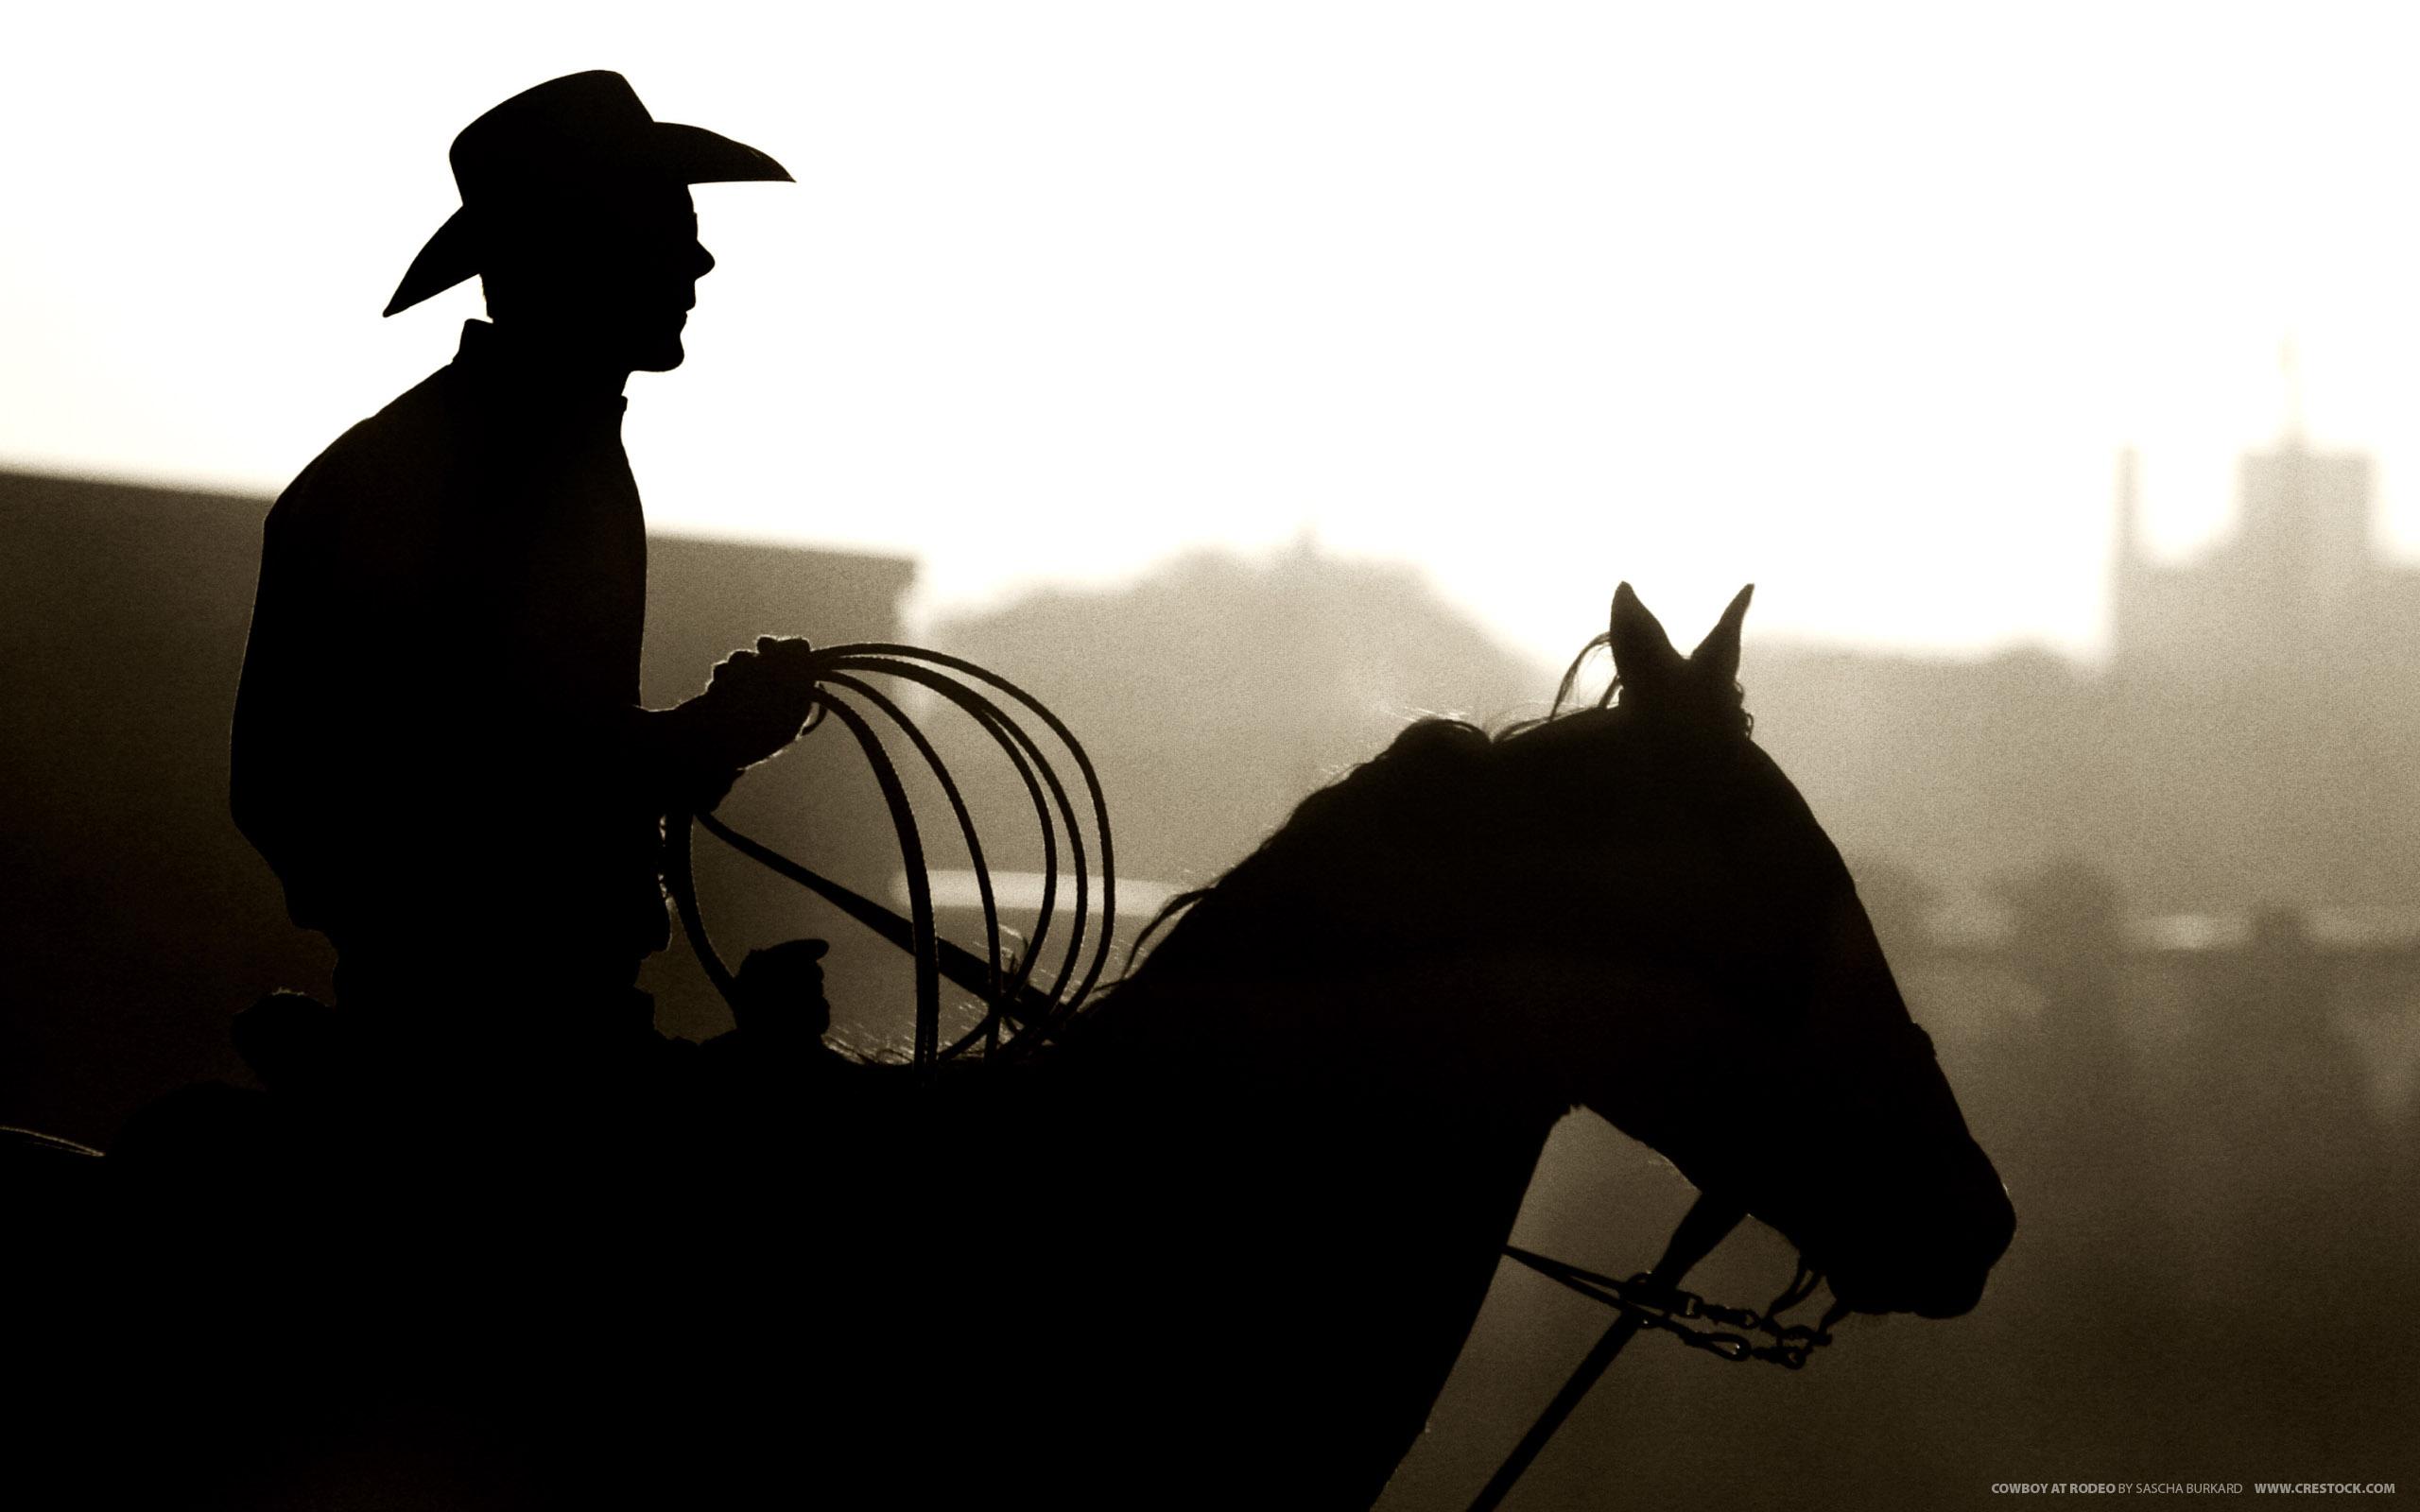 Cowboy at Rodeo | 2560 x 1600 | Download | Close